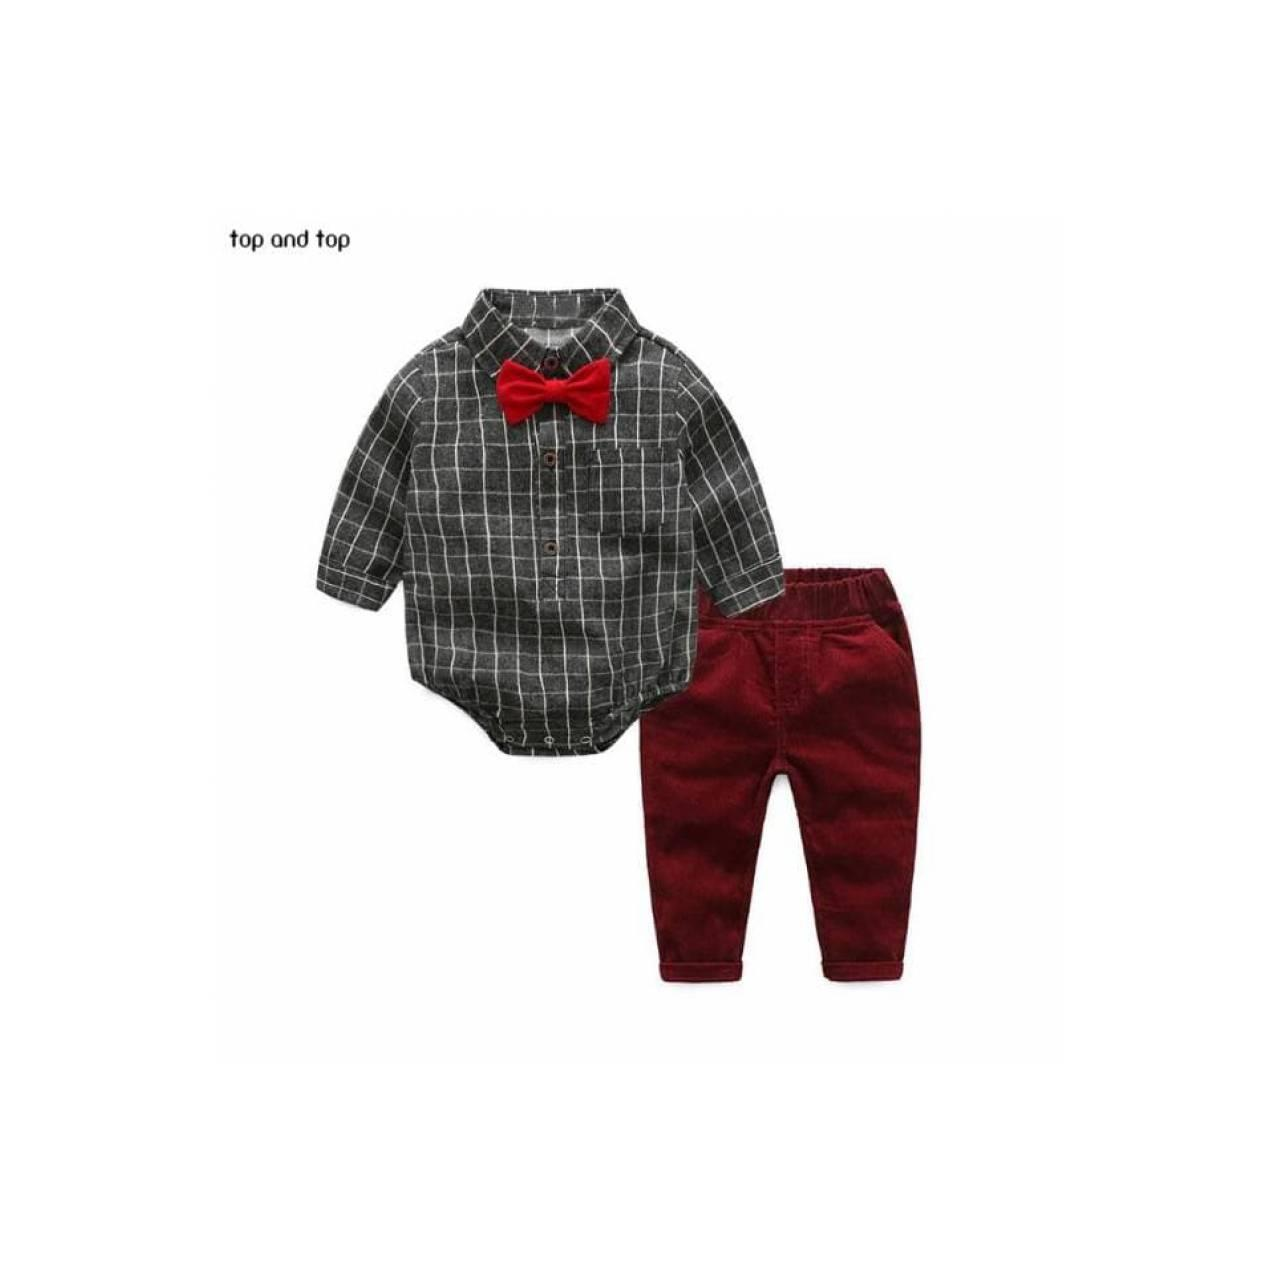 Freeshop Jumper Girl Sweet Heart C48 Pink Update Harga Terkini dan Source · Freeshop Kids Fashion Party 3 In 1 Tuxedo Kotak Dasi Kupu Red F962